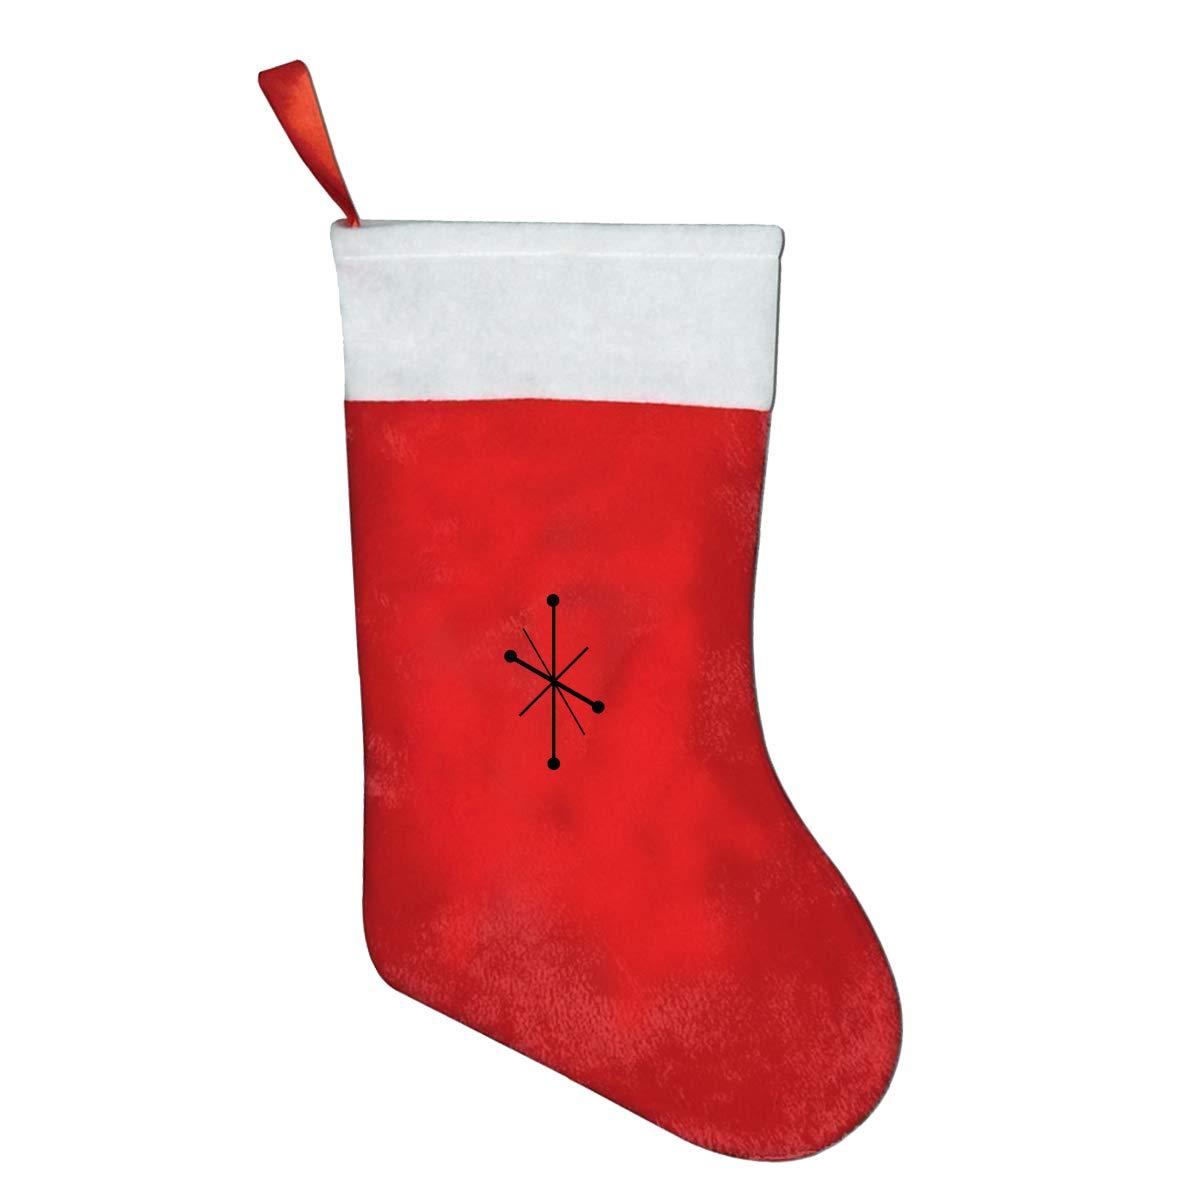 Amazon.com: WOWUSUO Star Clipart Christmas Stockings Add.